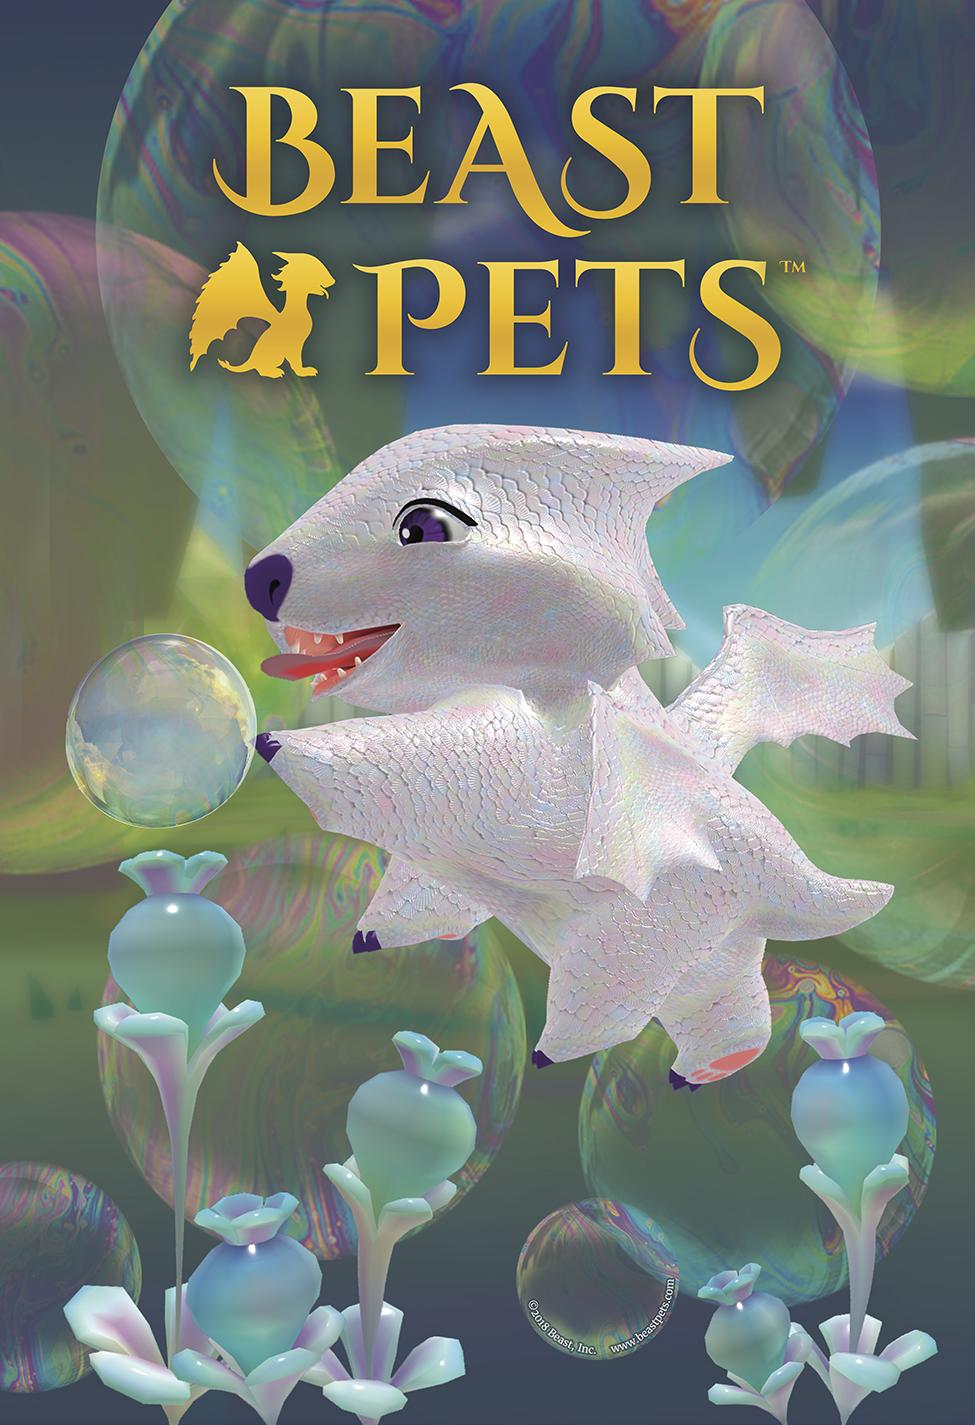 beastpets_poster1-2_Opal_thumbnail.png